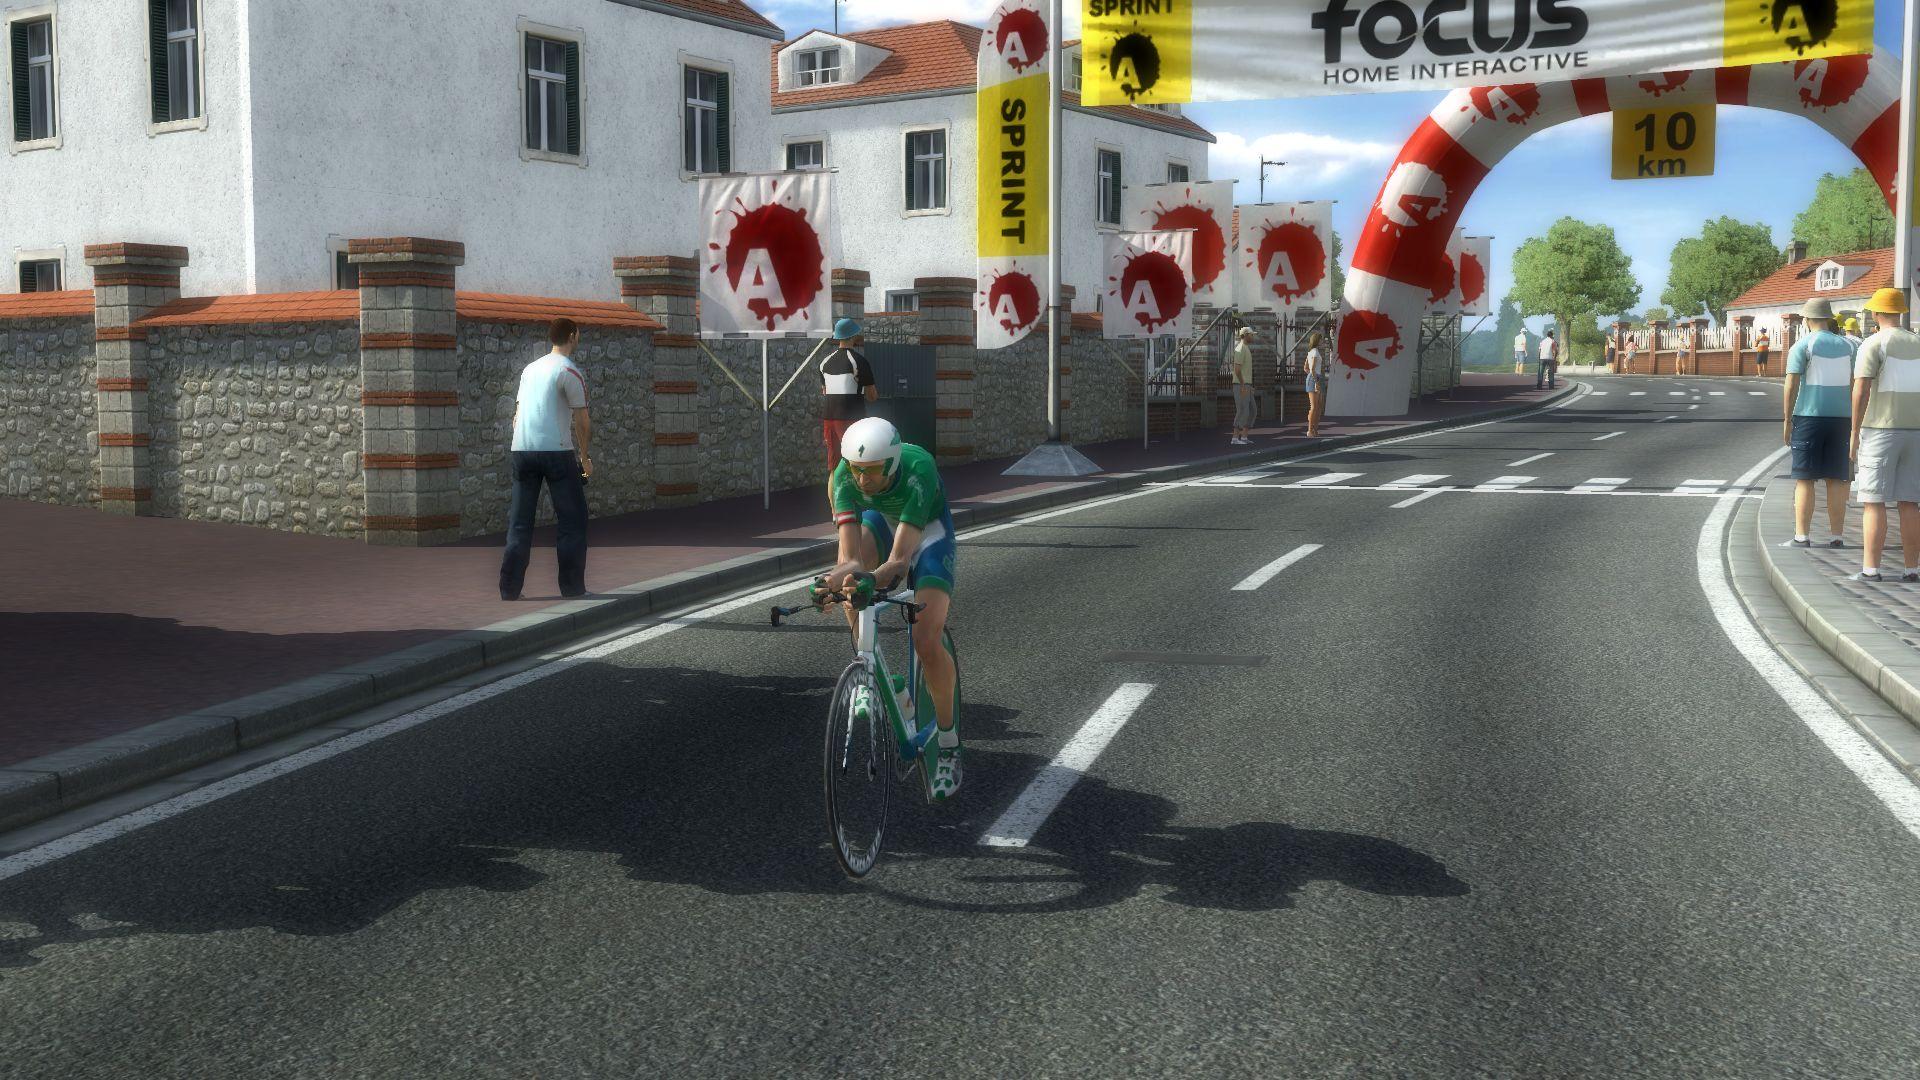 pcmdaily.com/images/mg/2019/Races/C1/Bayern/S4/mg19_bay_s04_20.jpg